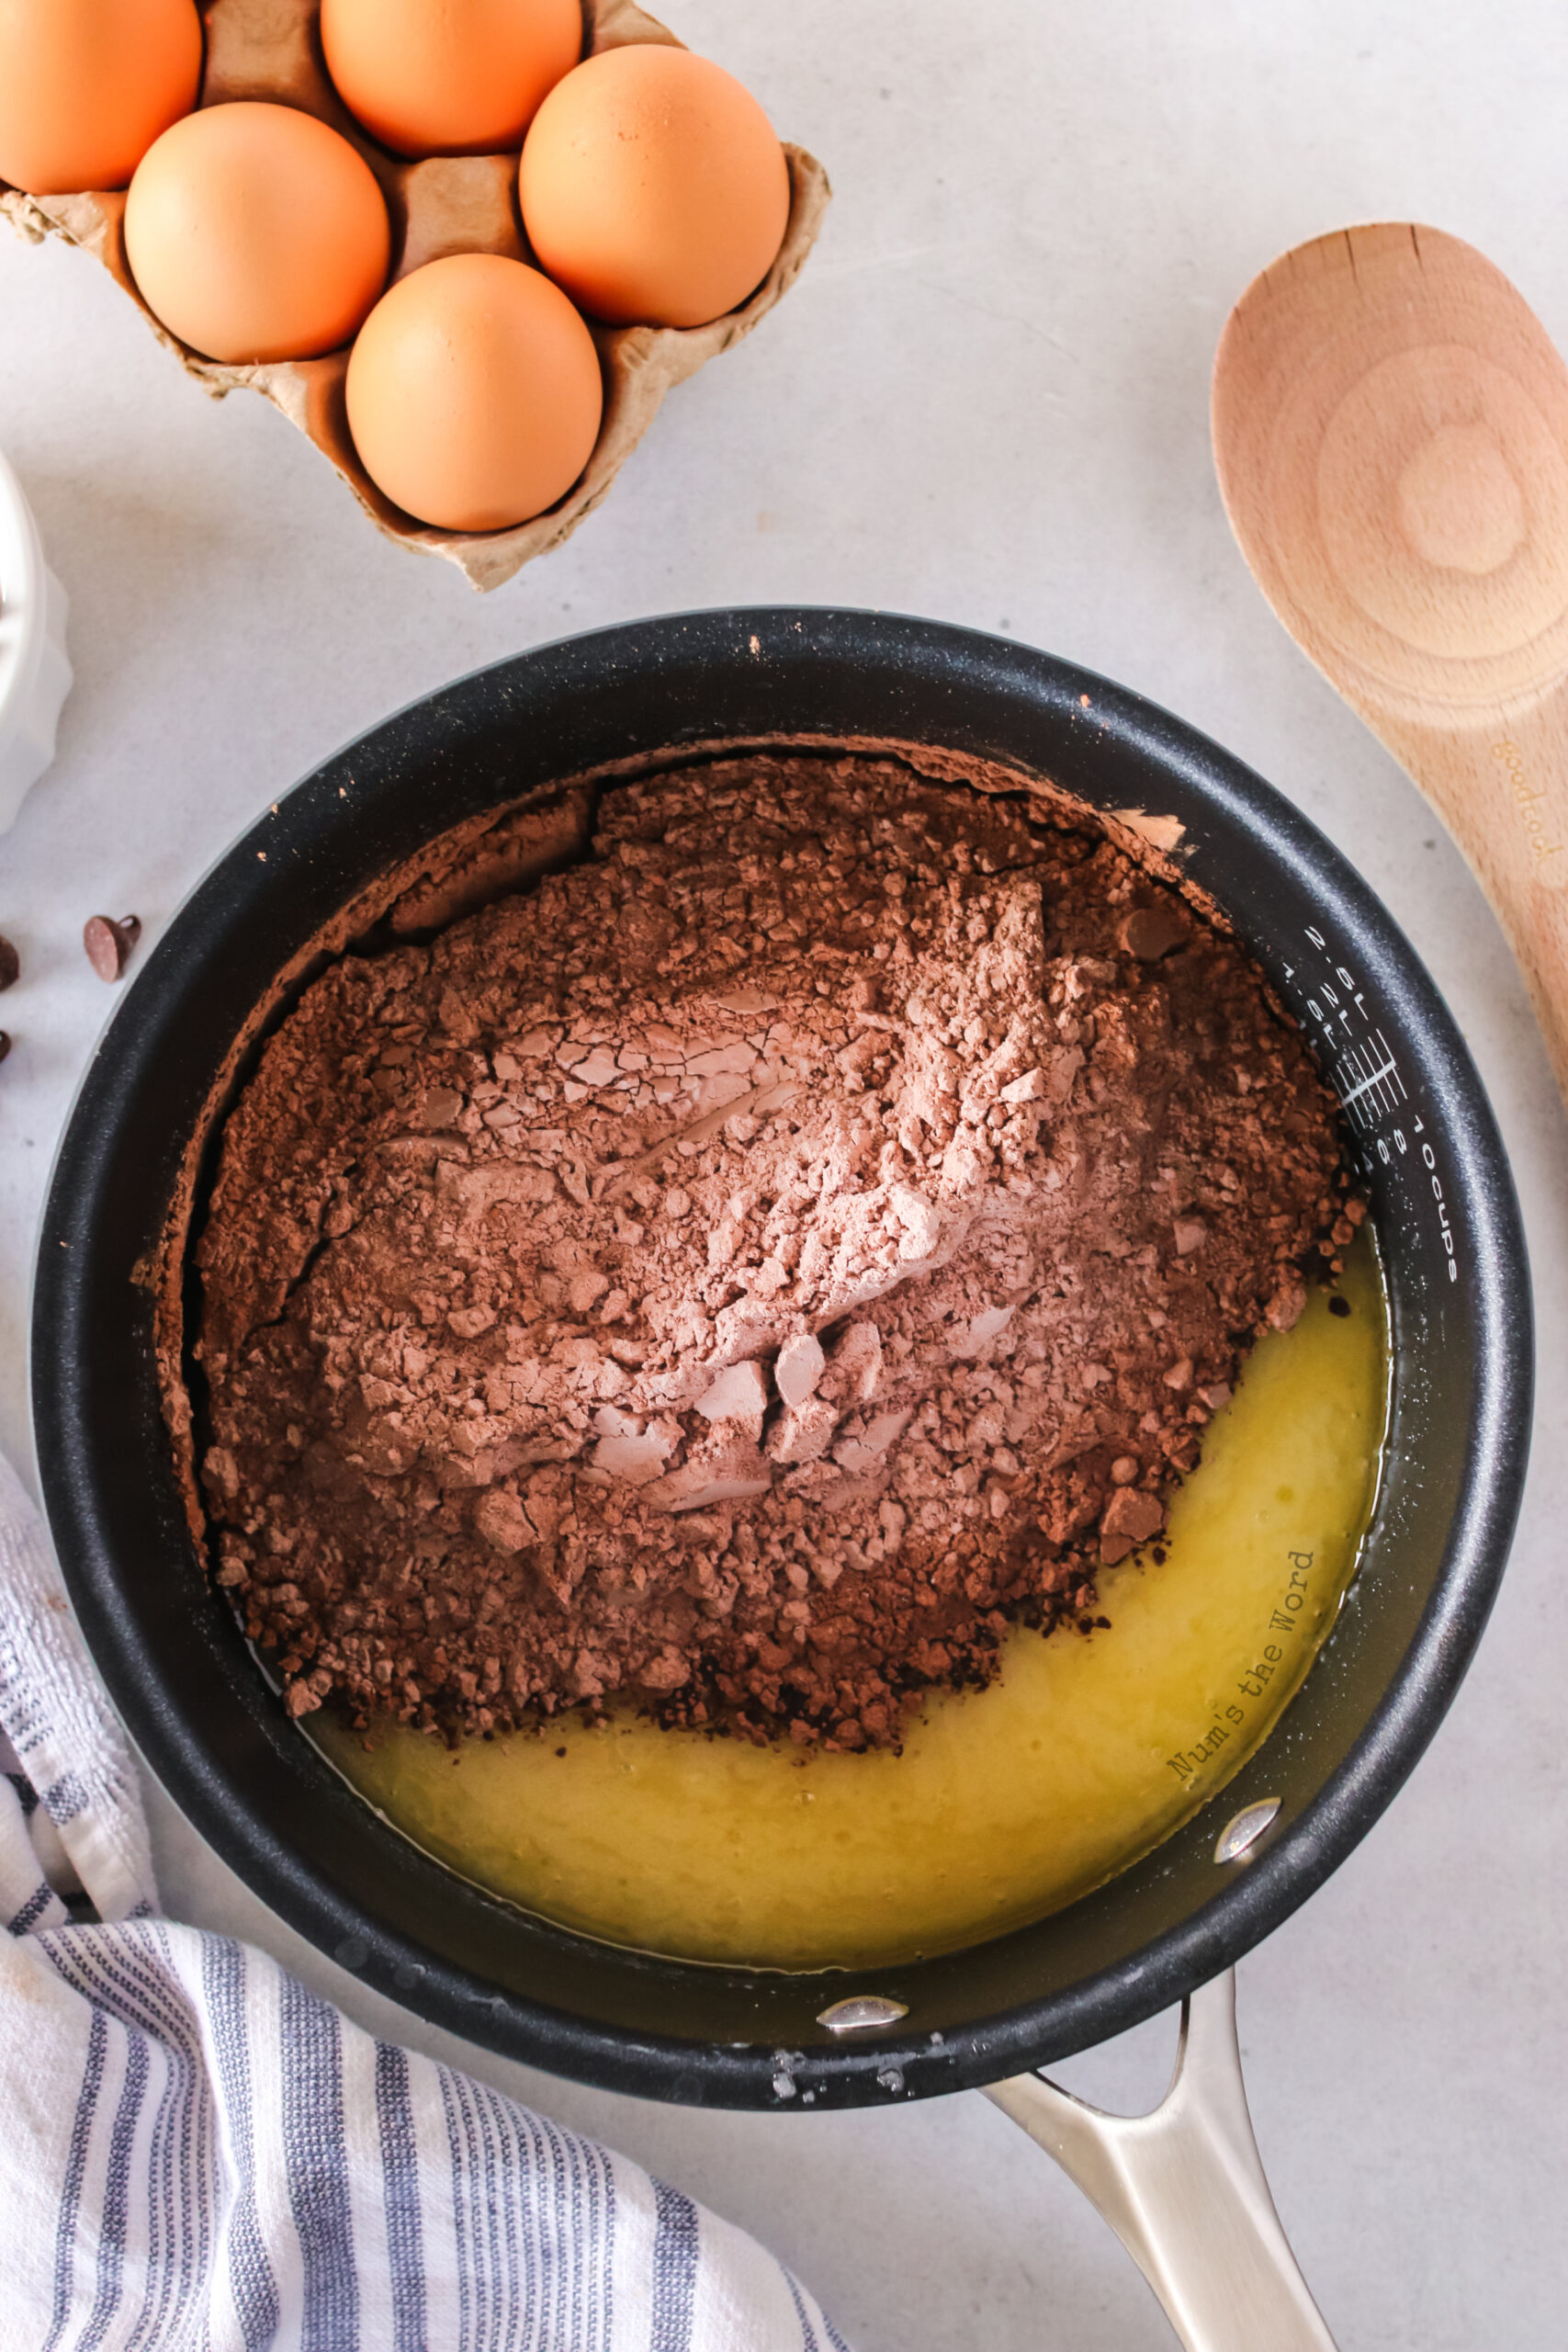 flour mixture poured into the butter saucepan.